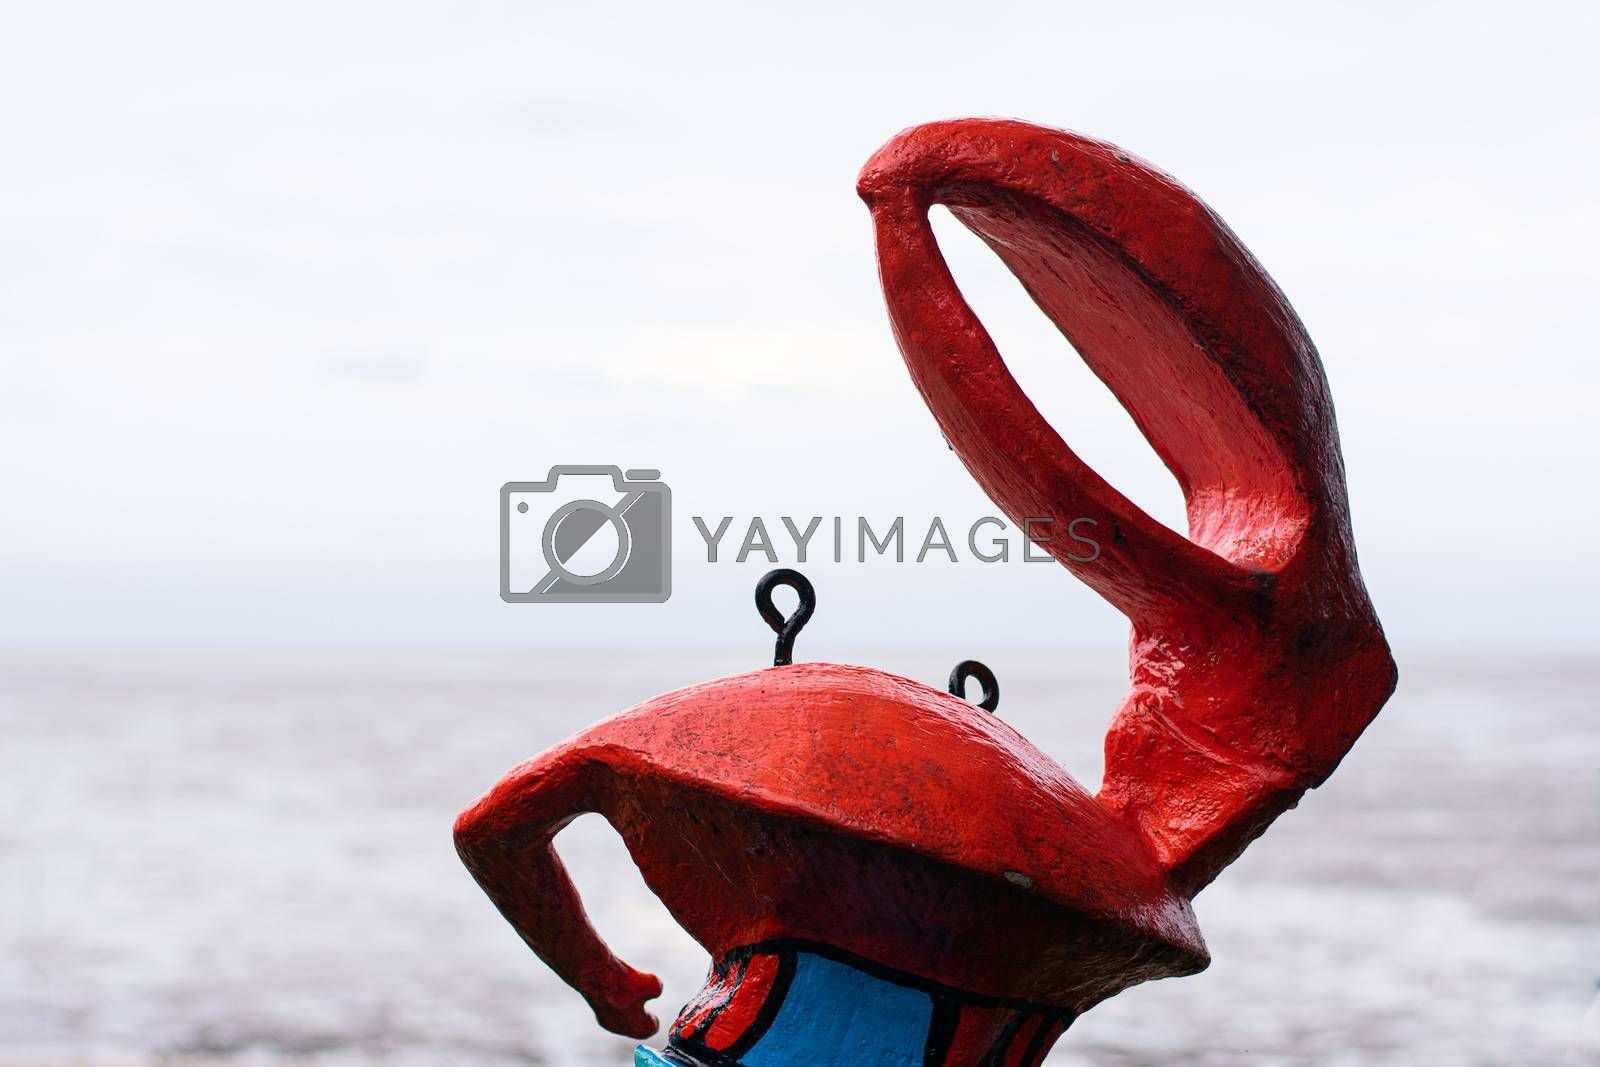 Red crab statue on sandy beach